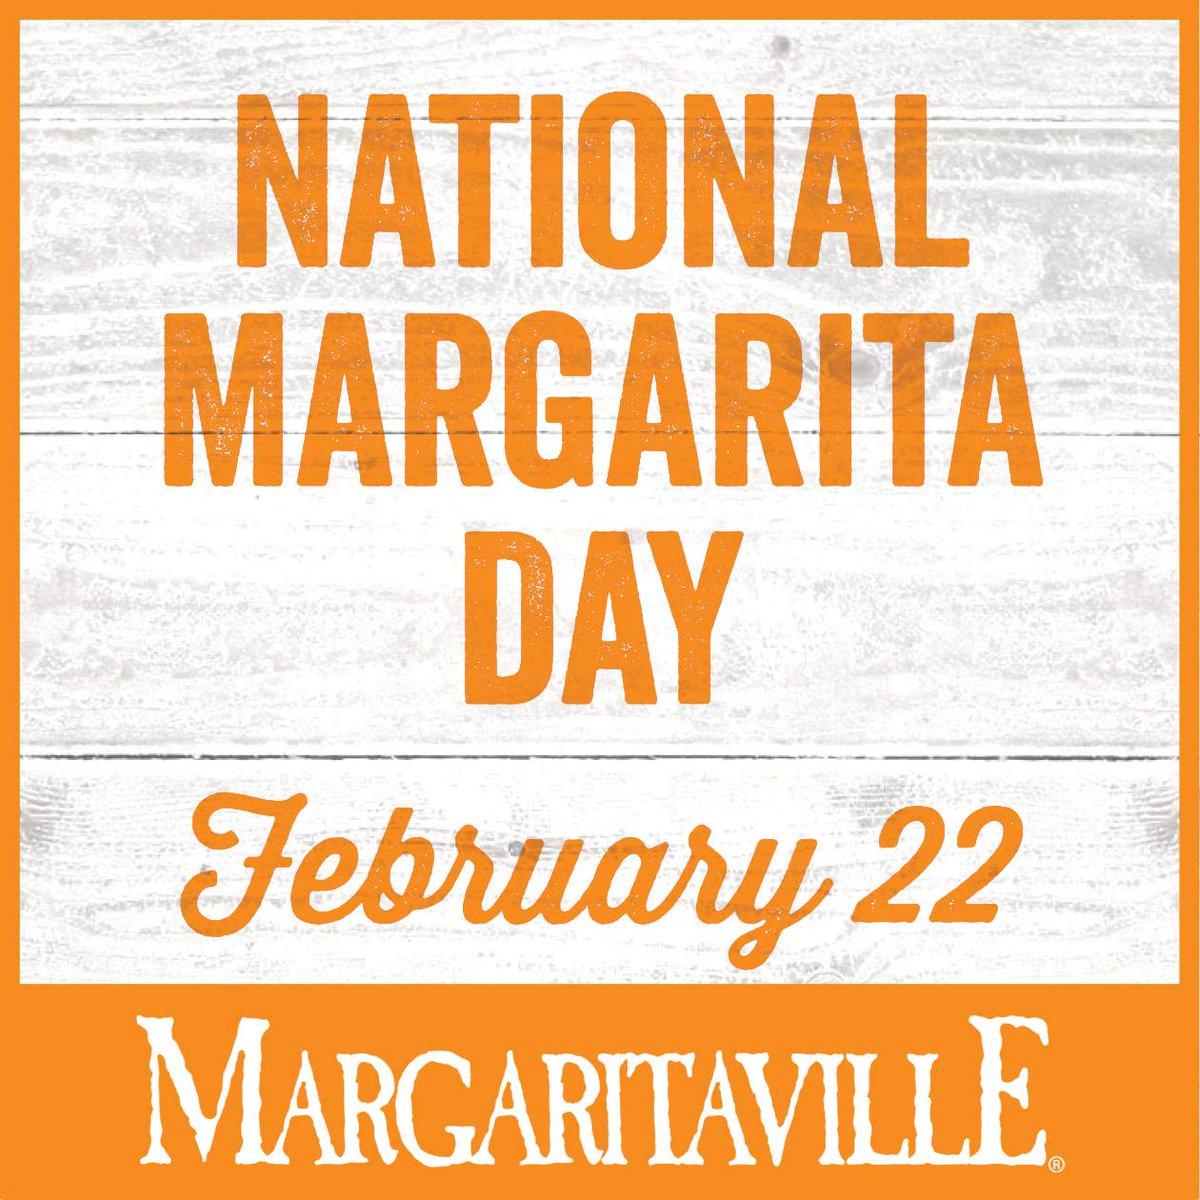 Happy #NationalMargaritaDay! @Margaritaville is celebrating all week long! http://t.co/GTKbaEEYKN http://t.co/gtr9syIwHN